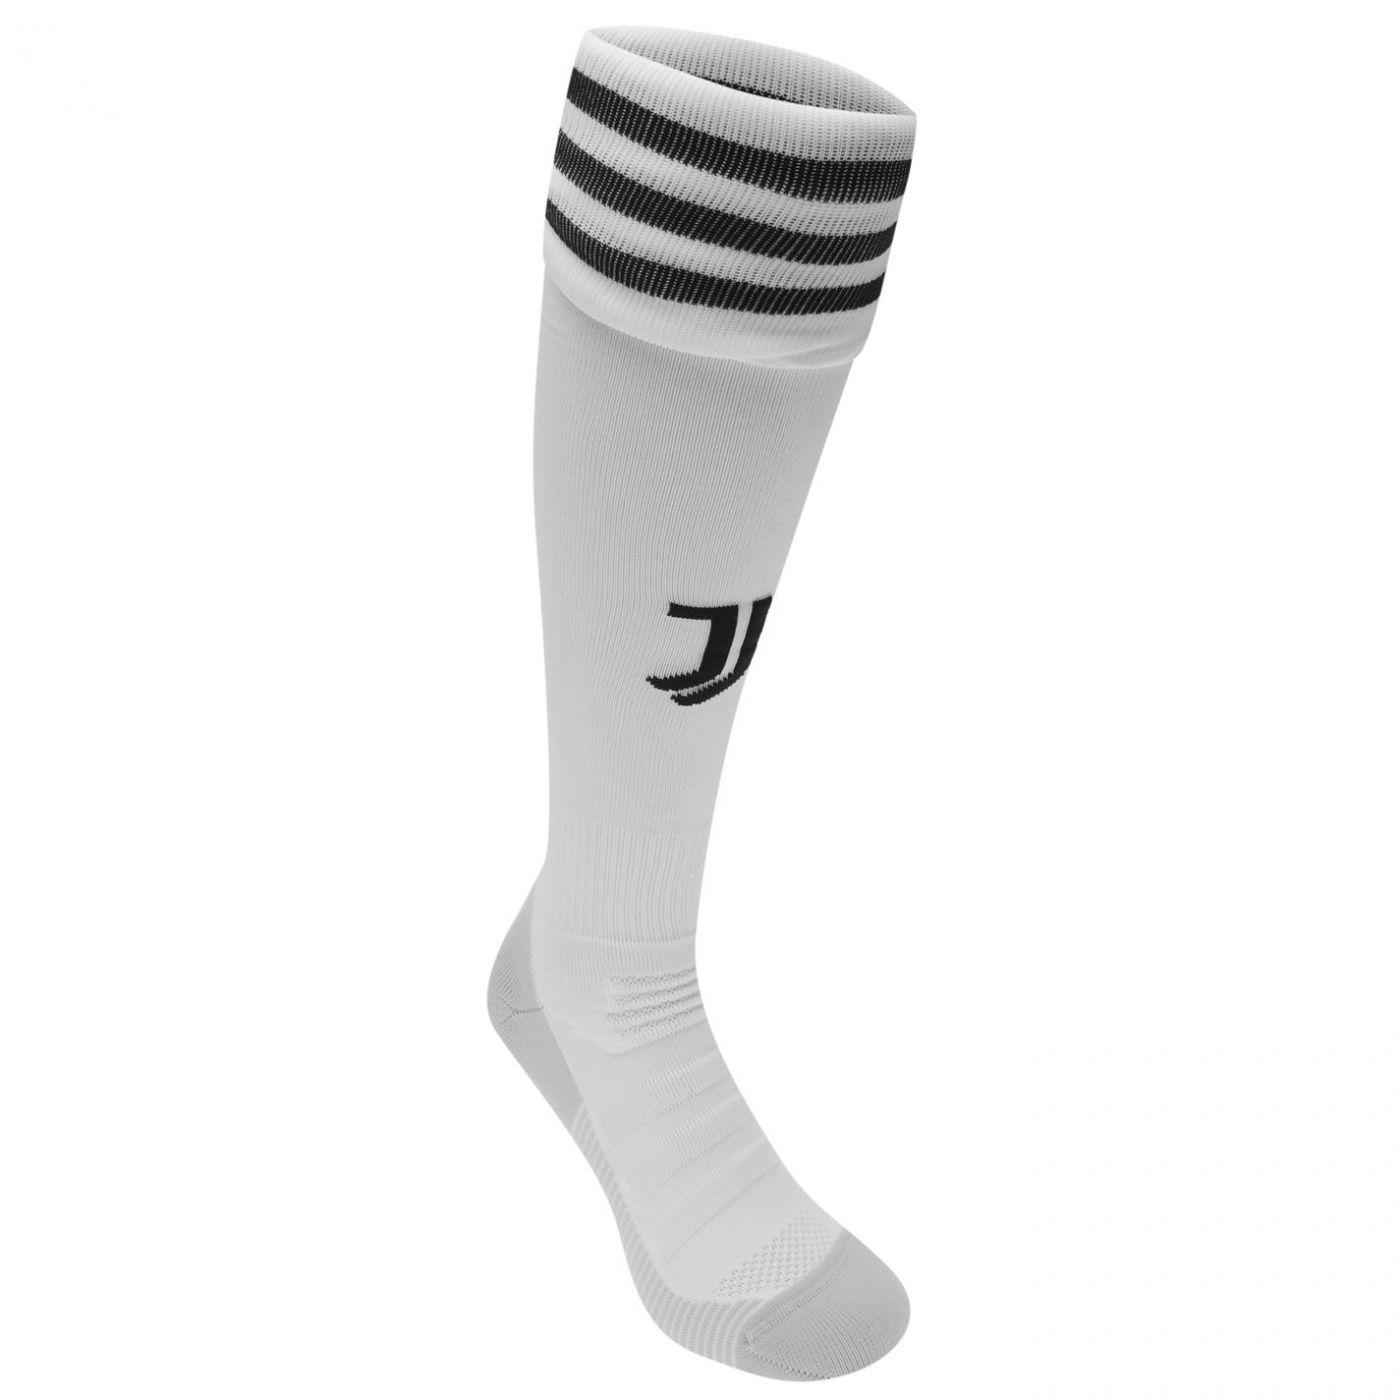 9eb0abd37ef7 Adidas Juventus Home Socks 2018 2019 - FACTCOOL